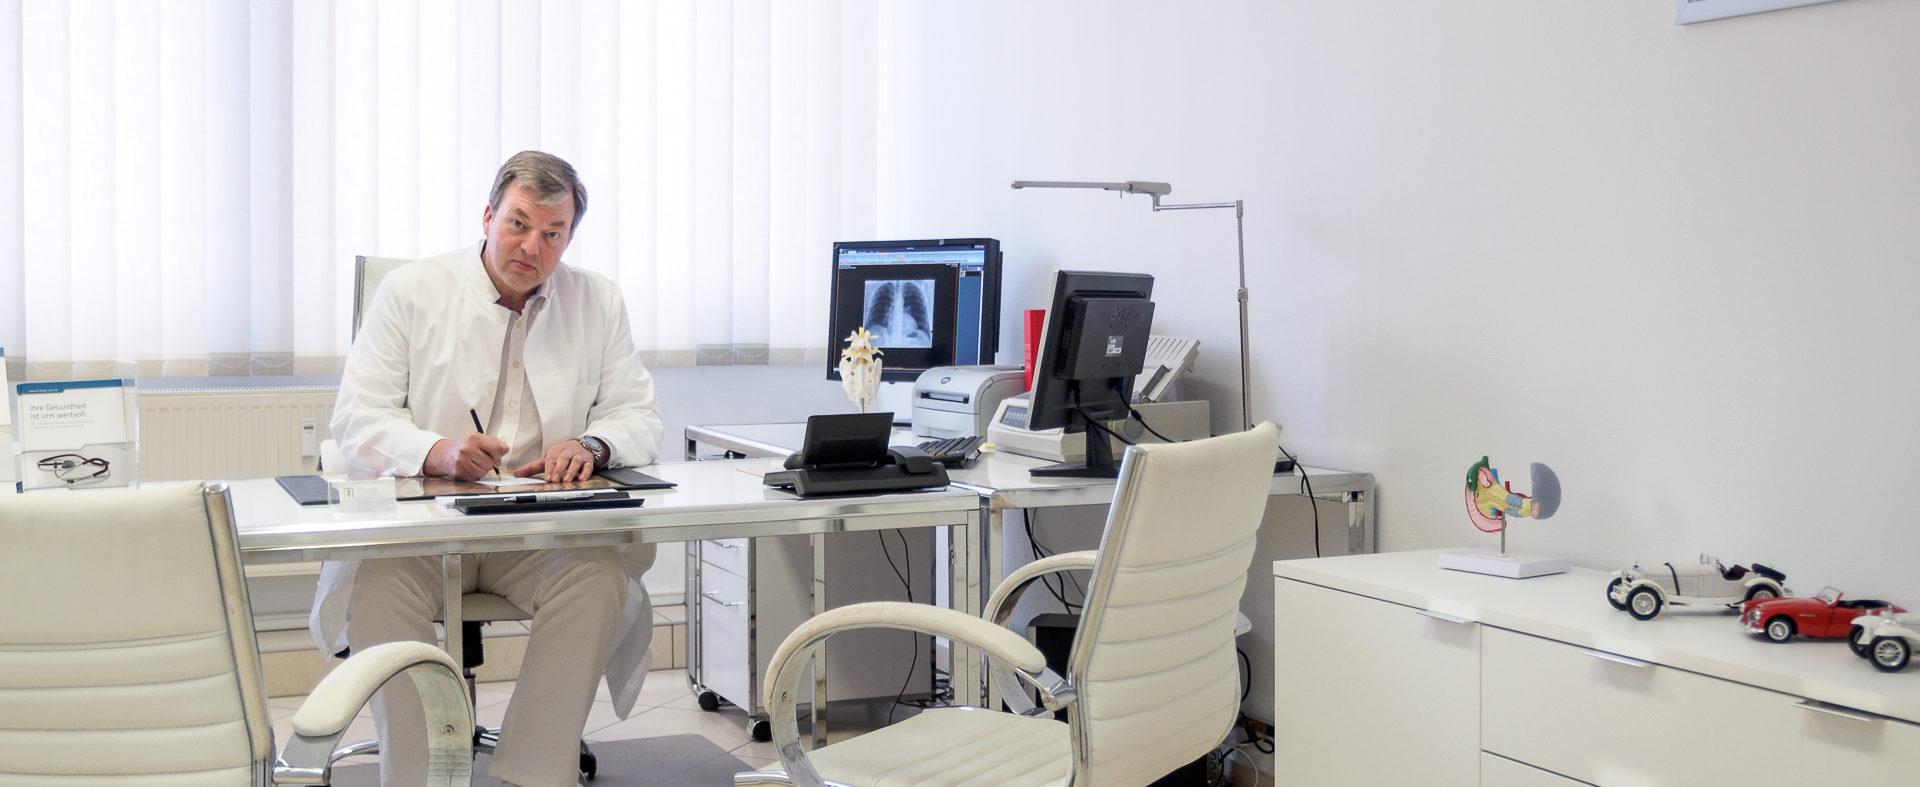 Dr-Guido-Feyder-im-Behandlungszimmer1